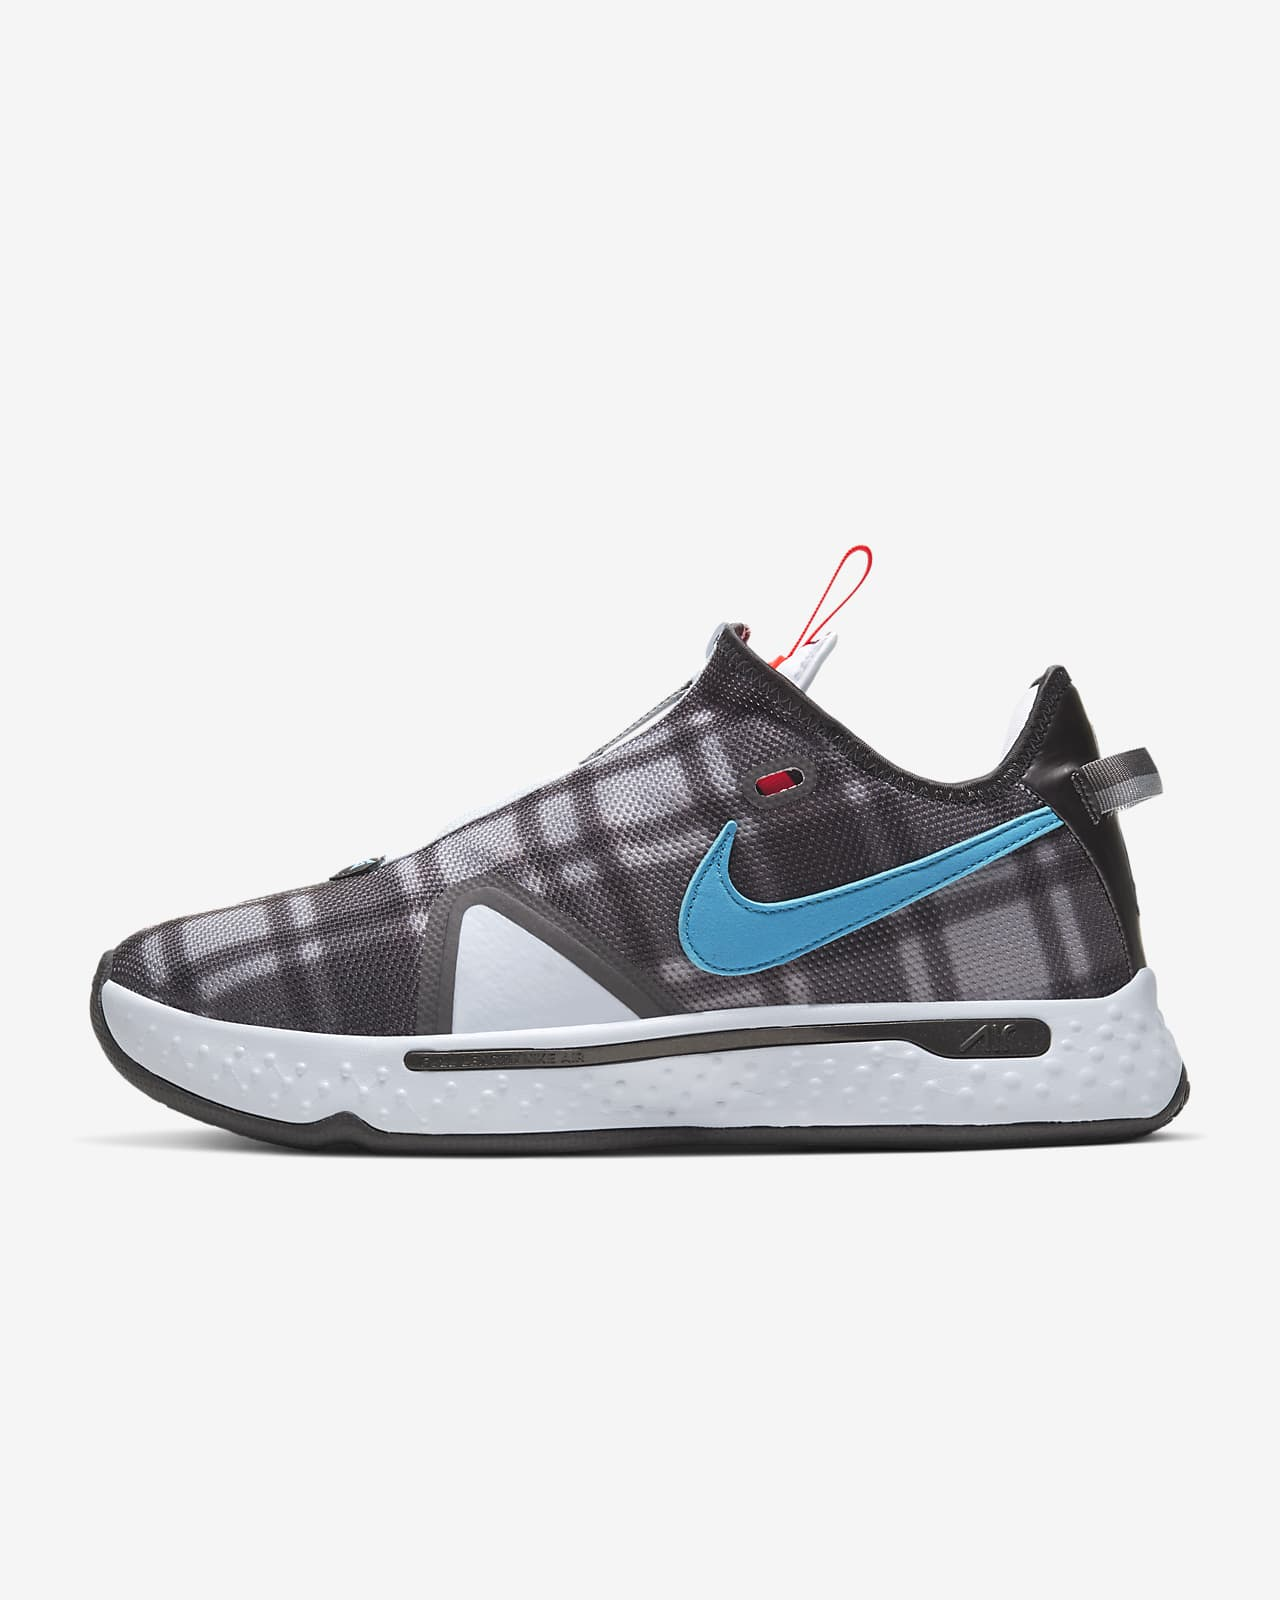 PG4 Basketball Shoes